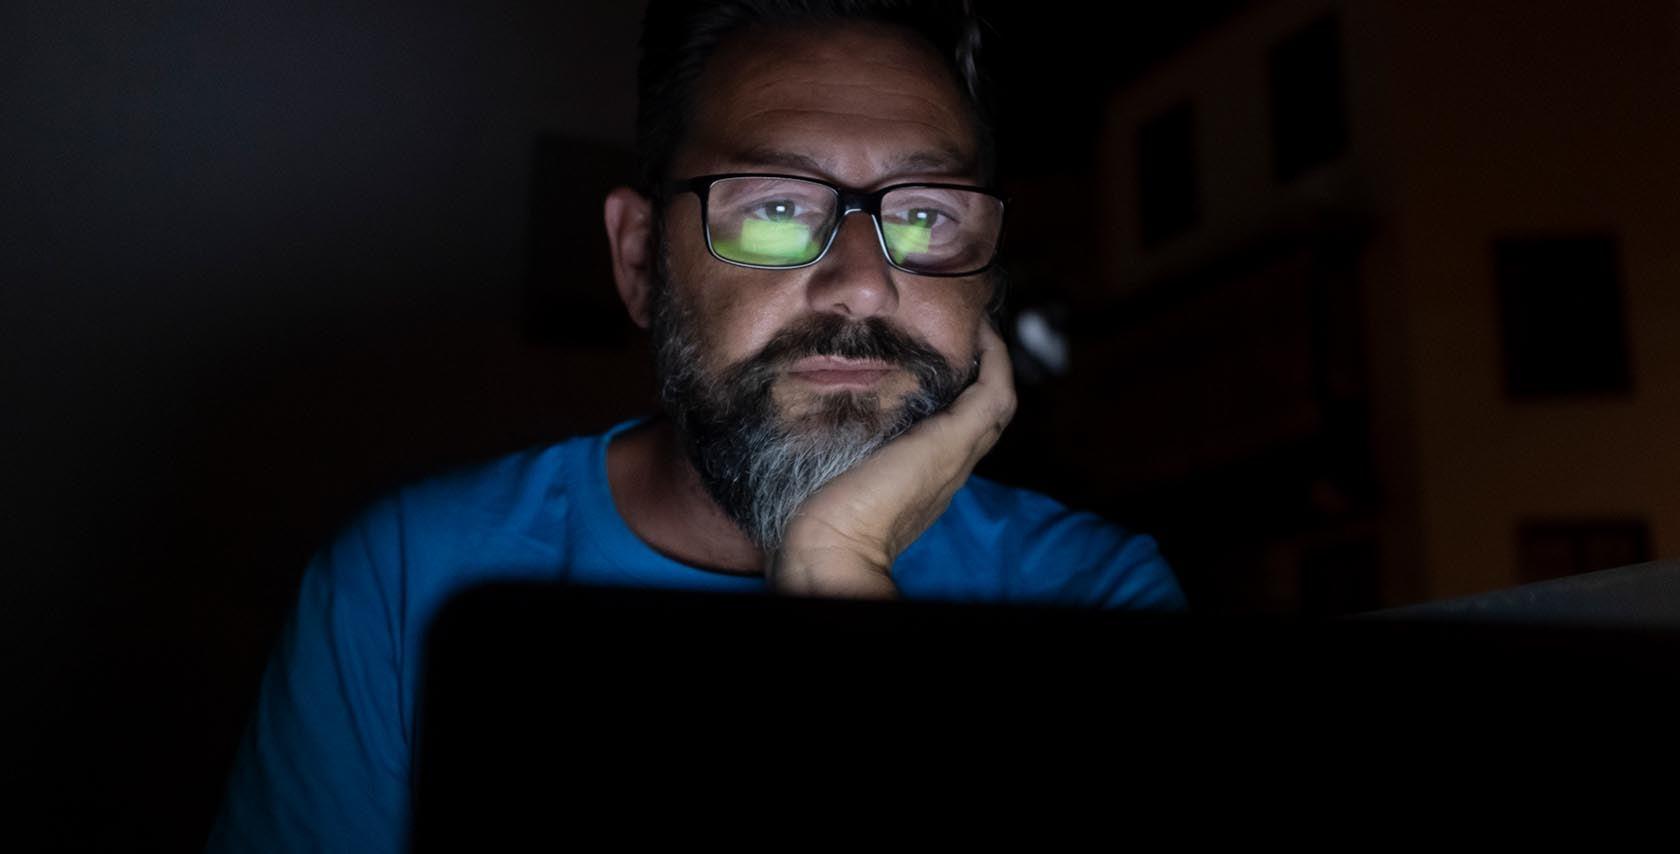 man staring at computer in the dark